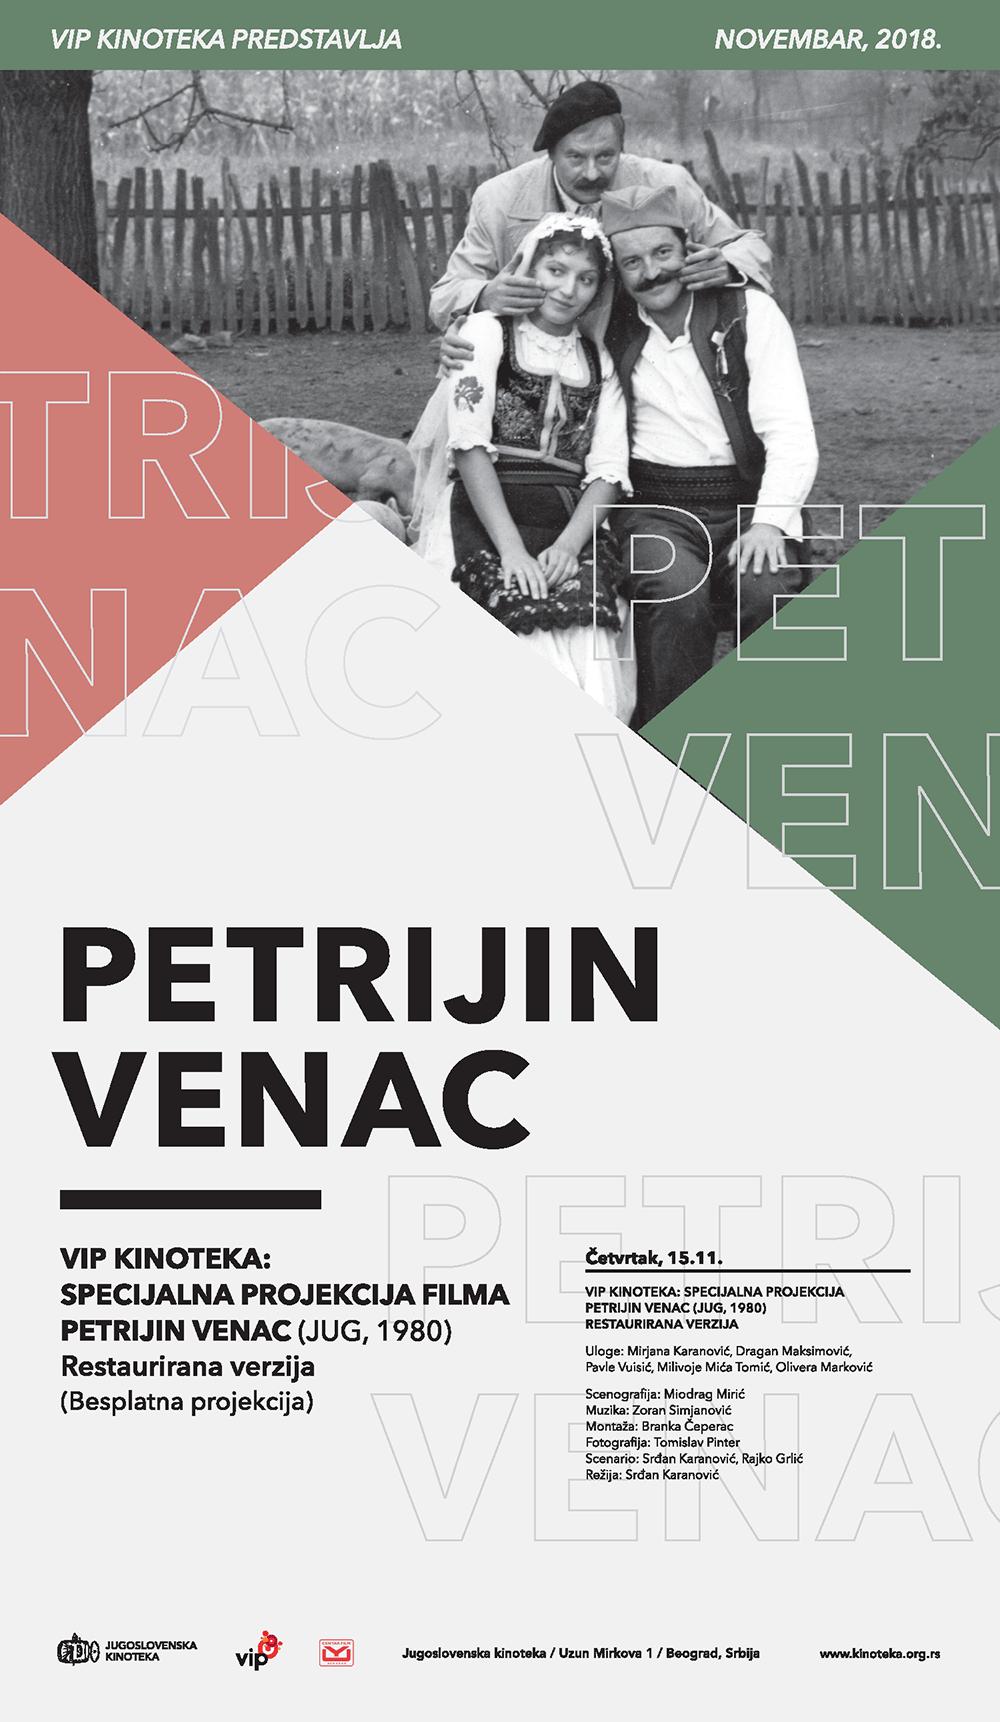 VIP KINOTEKA – PETRIJIN VENAC PRIVJU